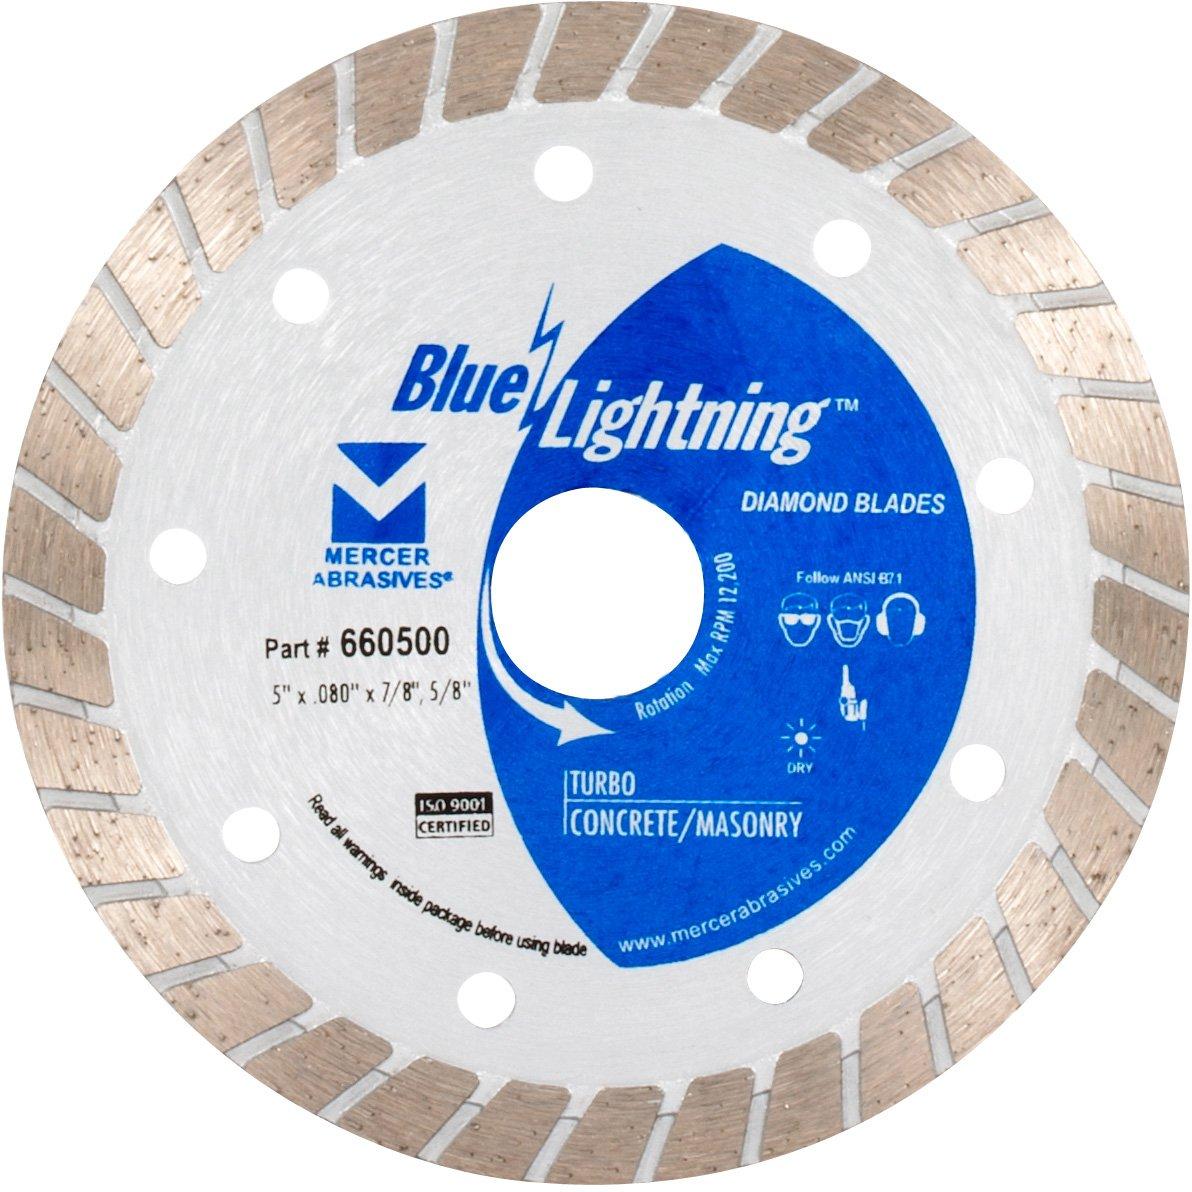 Disco de Diamante MERCER turbo Blue Lightning 660500 5 pulg.